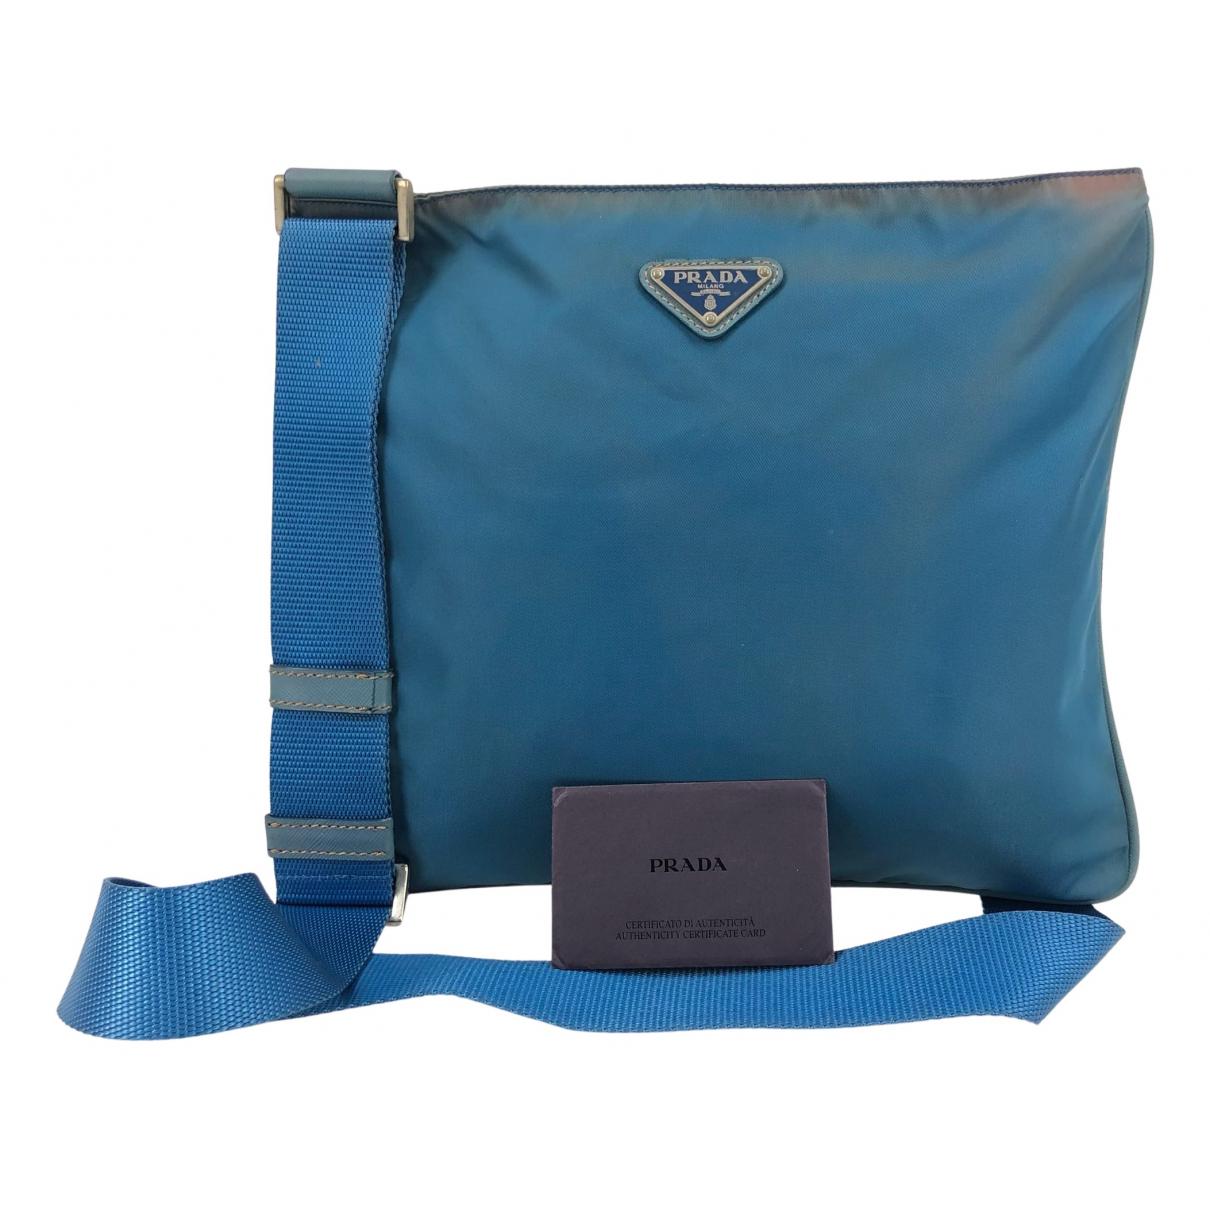 Prada - Sac a main   pour femme en toile - bleu